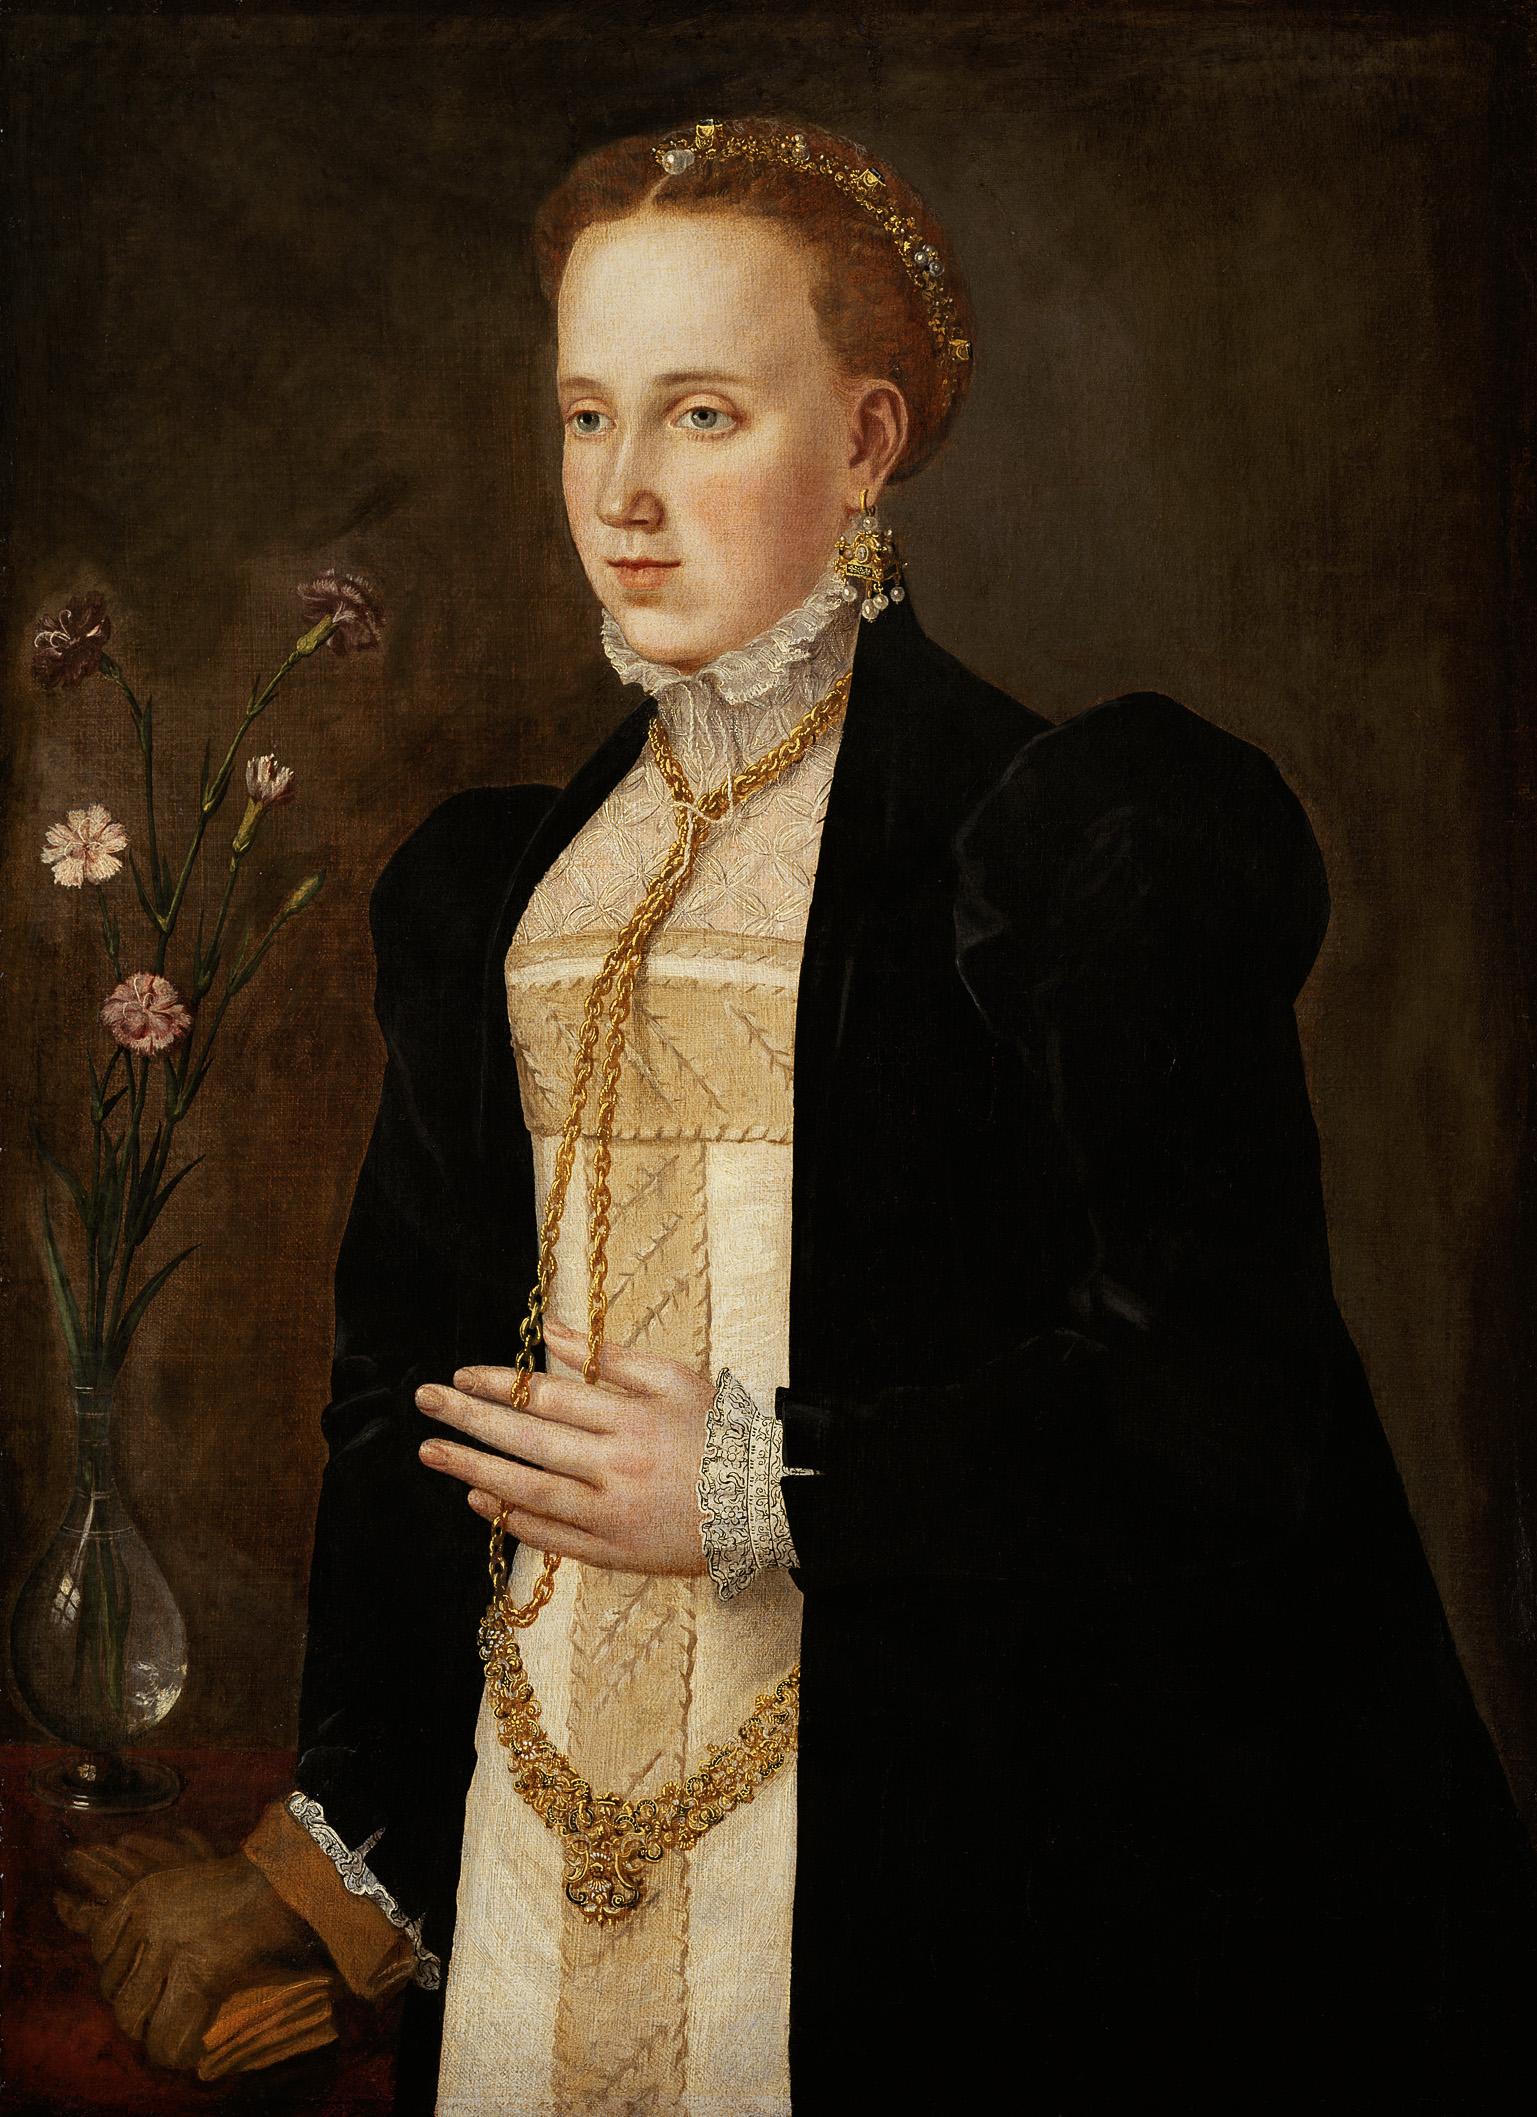 Philippine Welser, Portrait on Castle Ambras